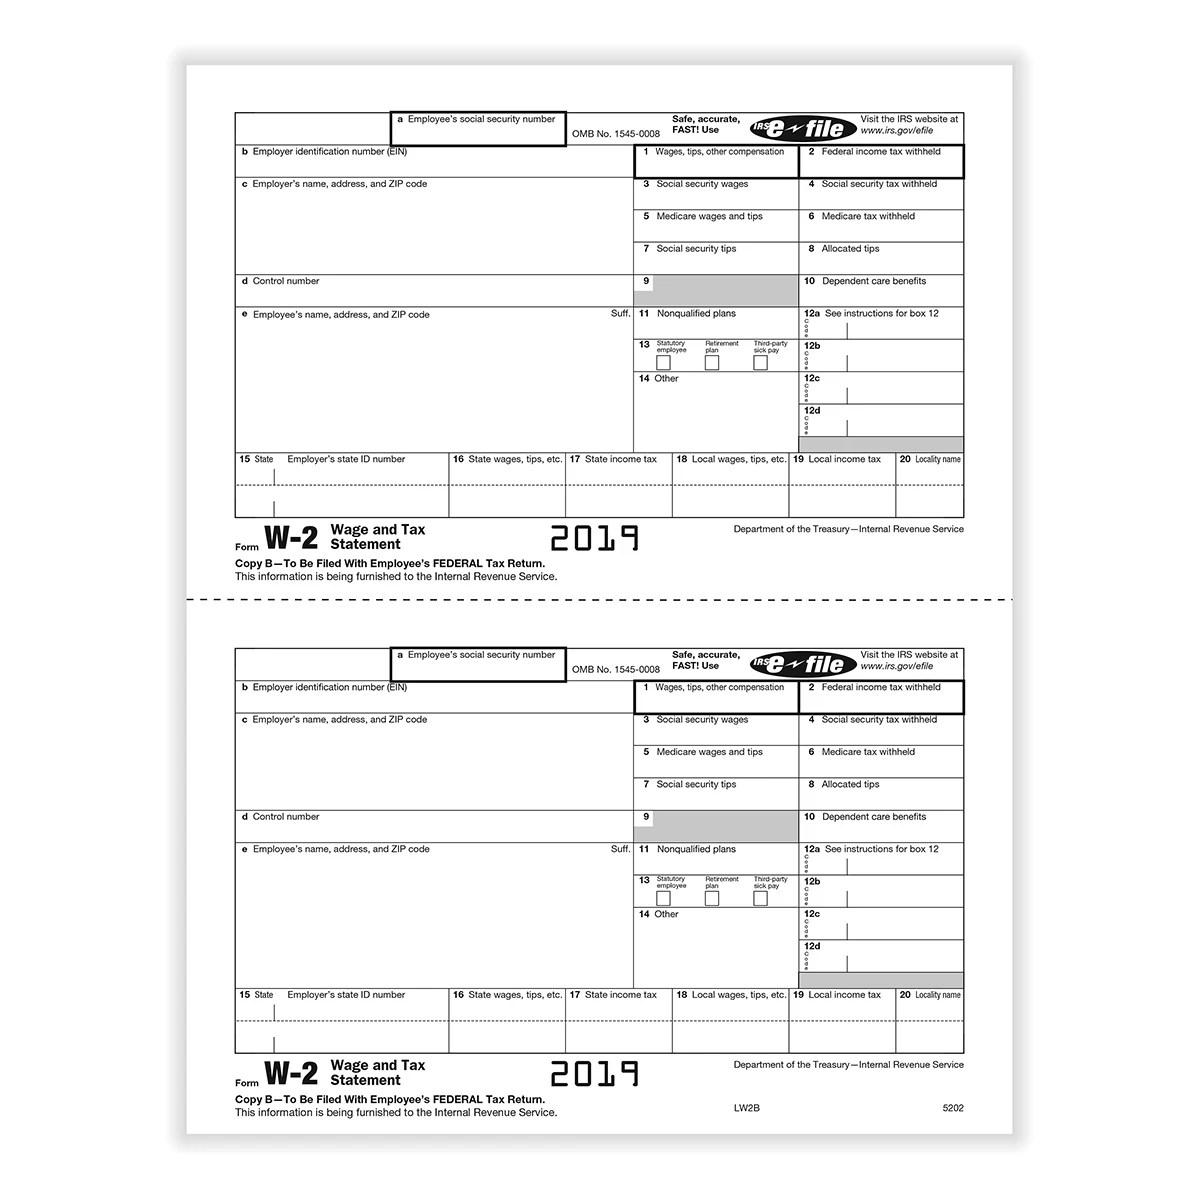 Form W 2 Copy B